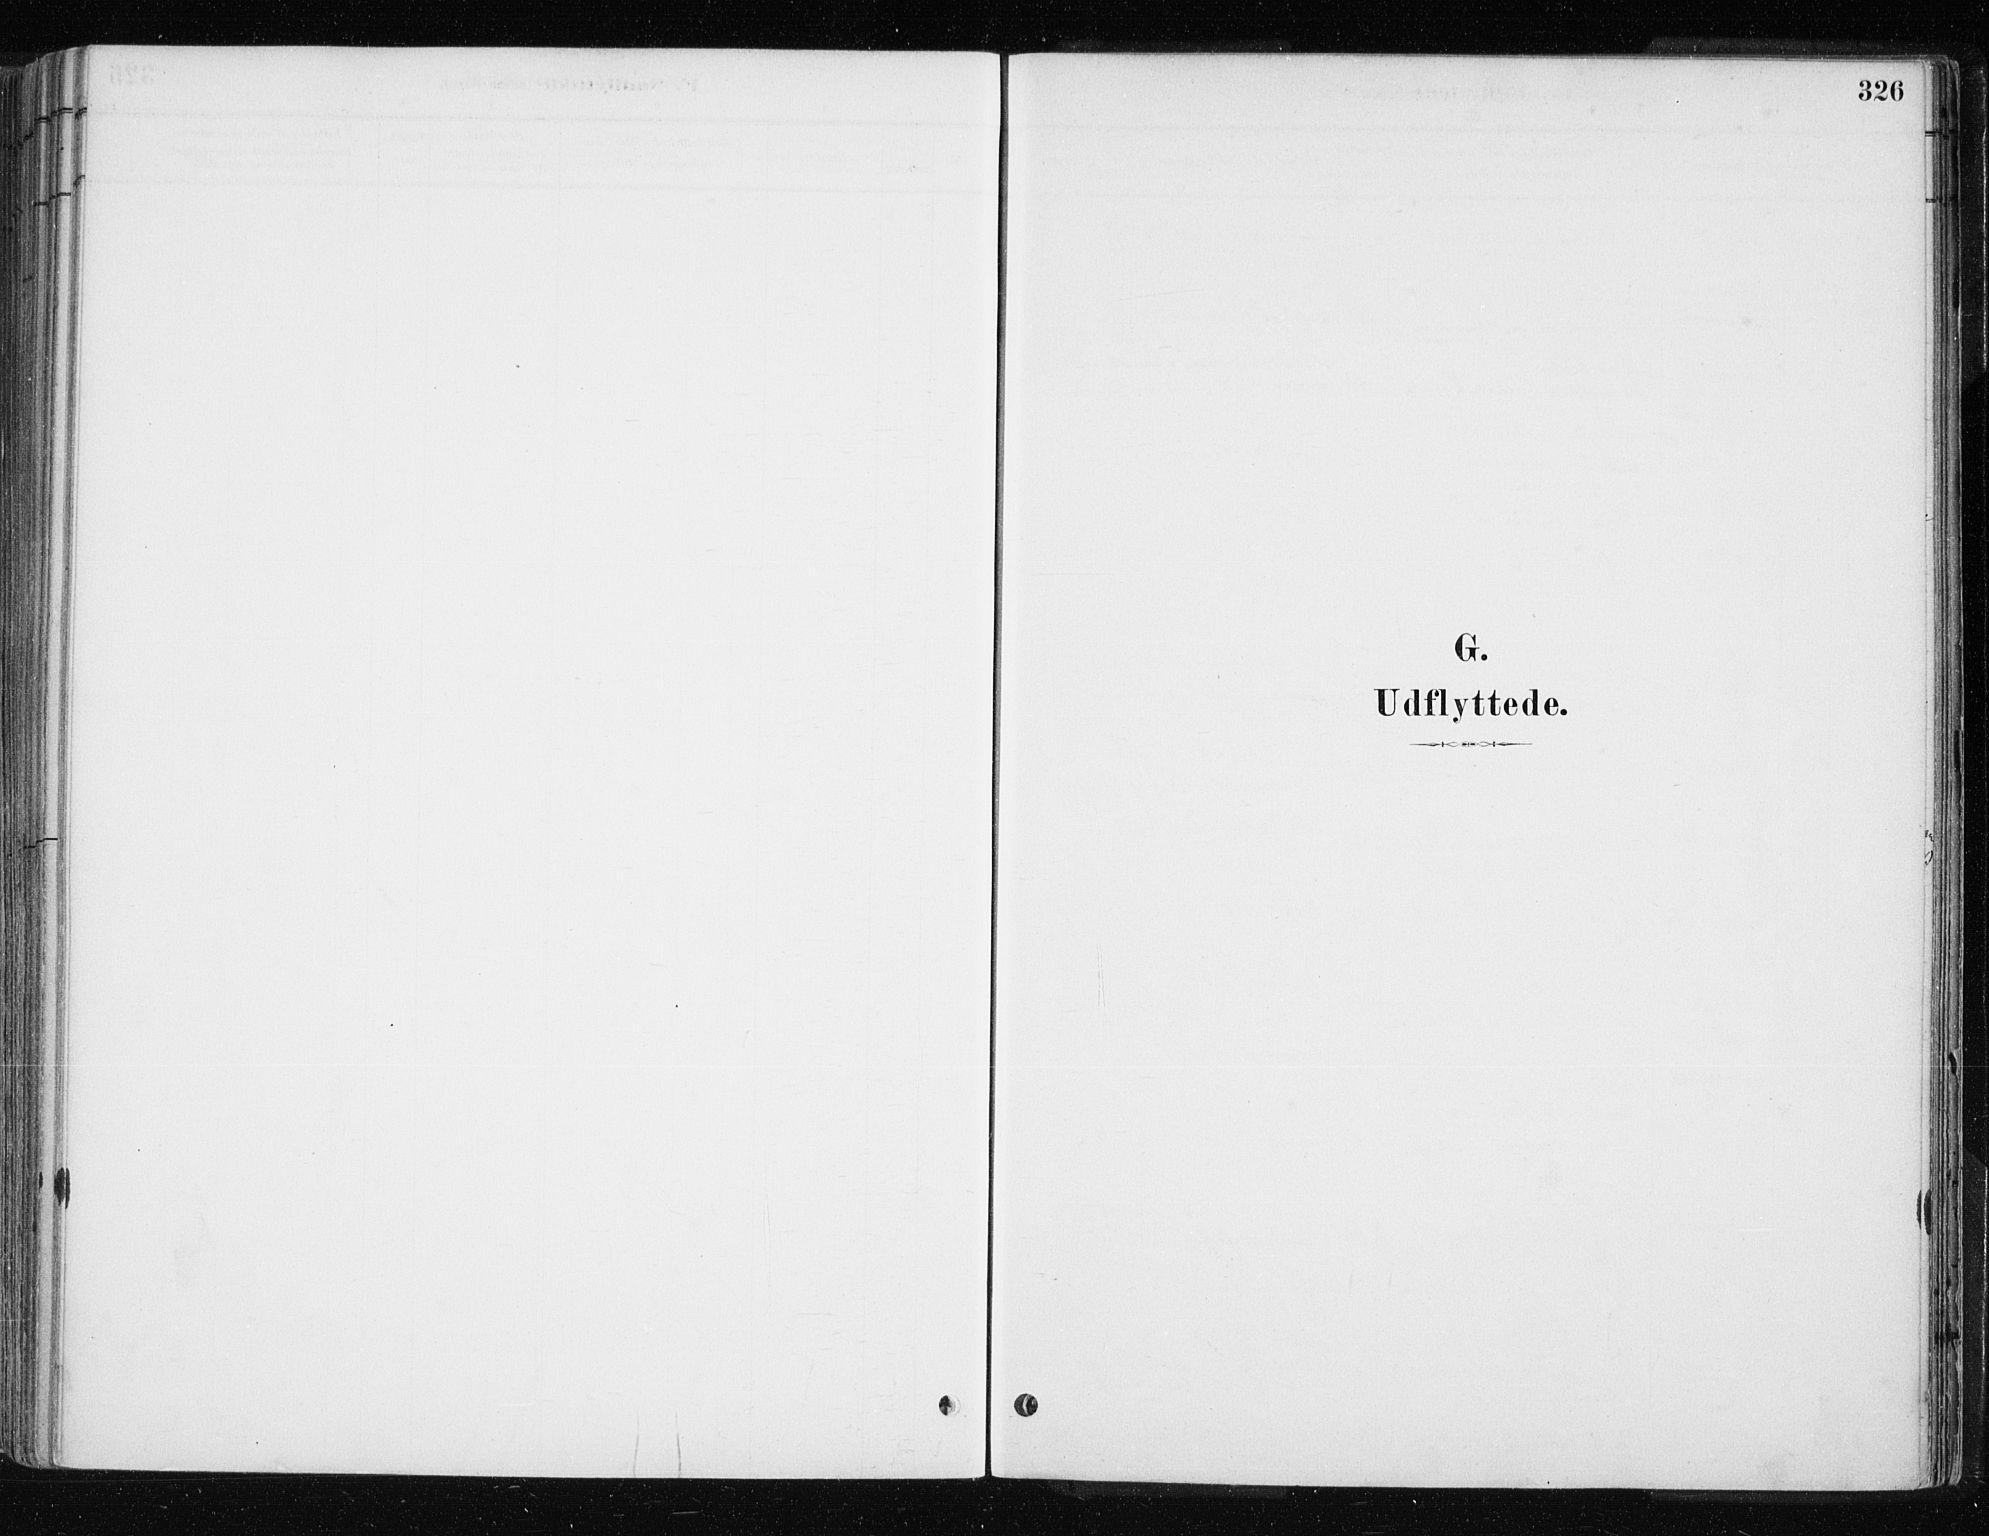 SATØ, Lyngen sokneprestembete, H/He/Hea/L0007kirke: Ministerialbok nr. 7, 1879-1890, s. 326